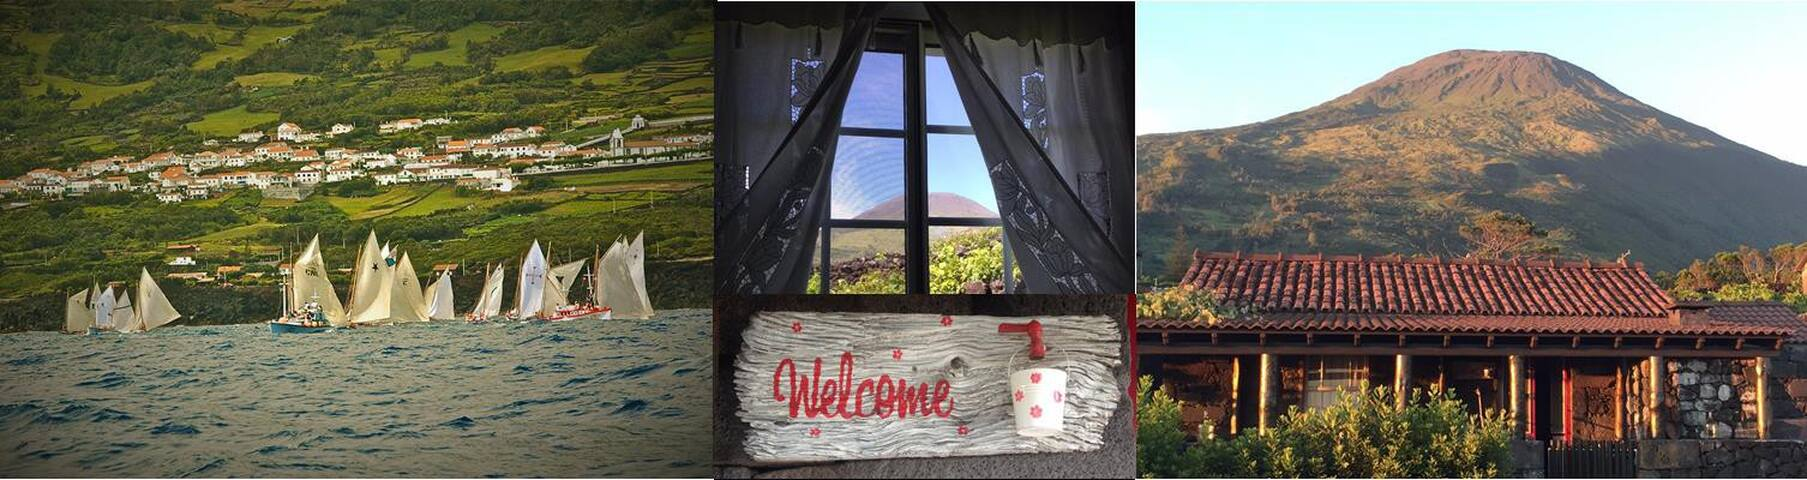 ADEGA JB (Wine House) - Accommodation